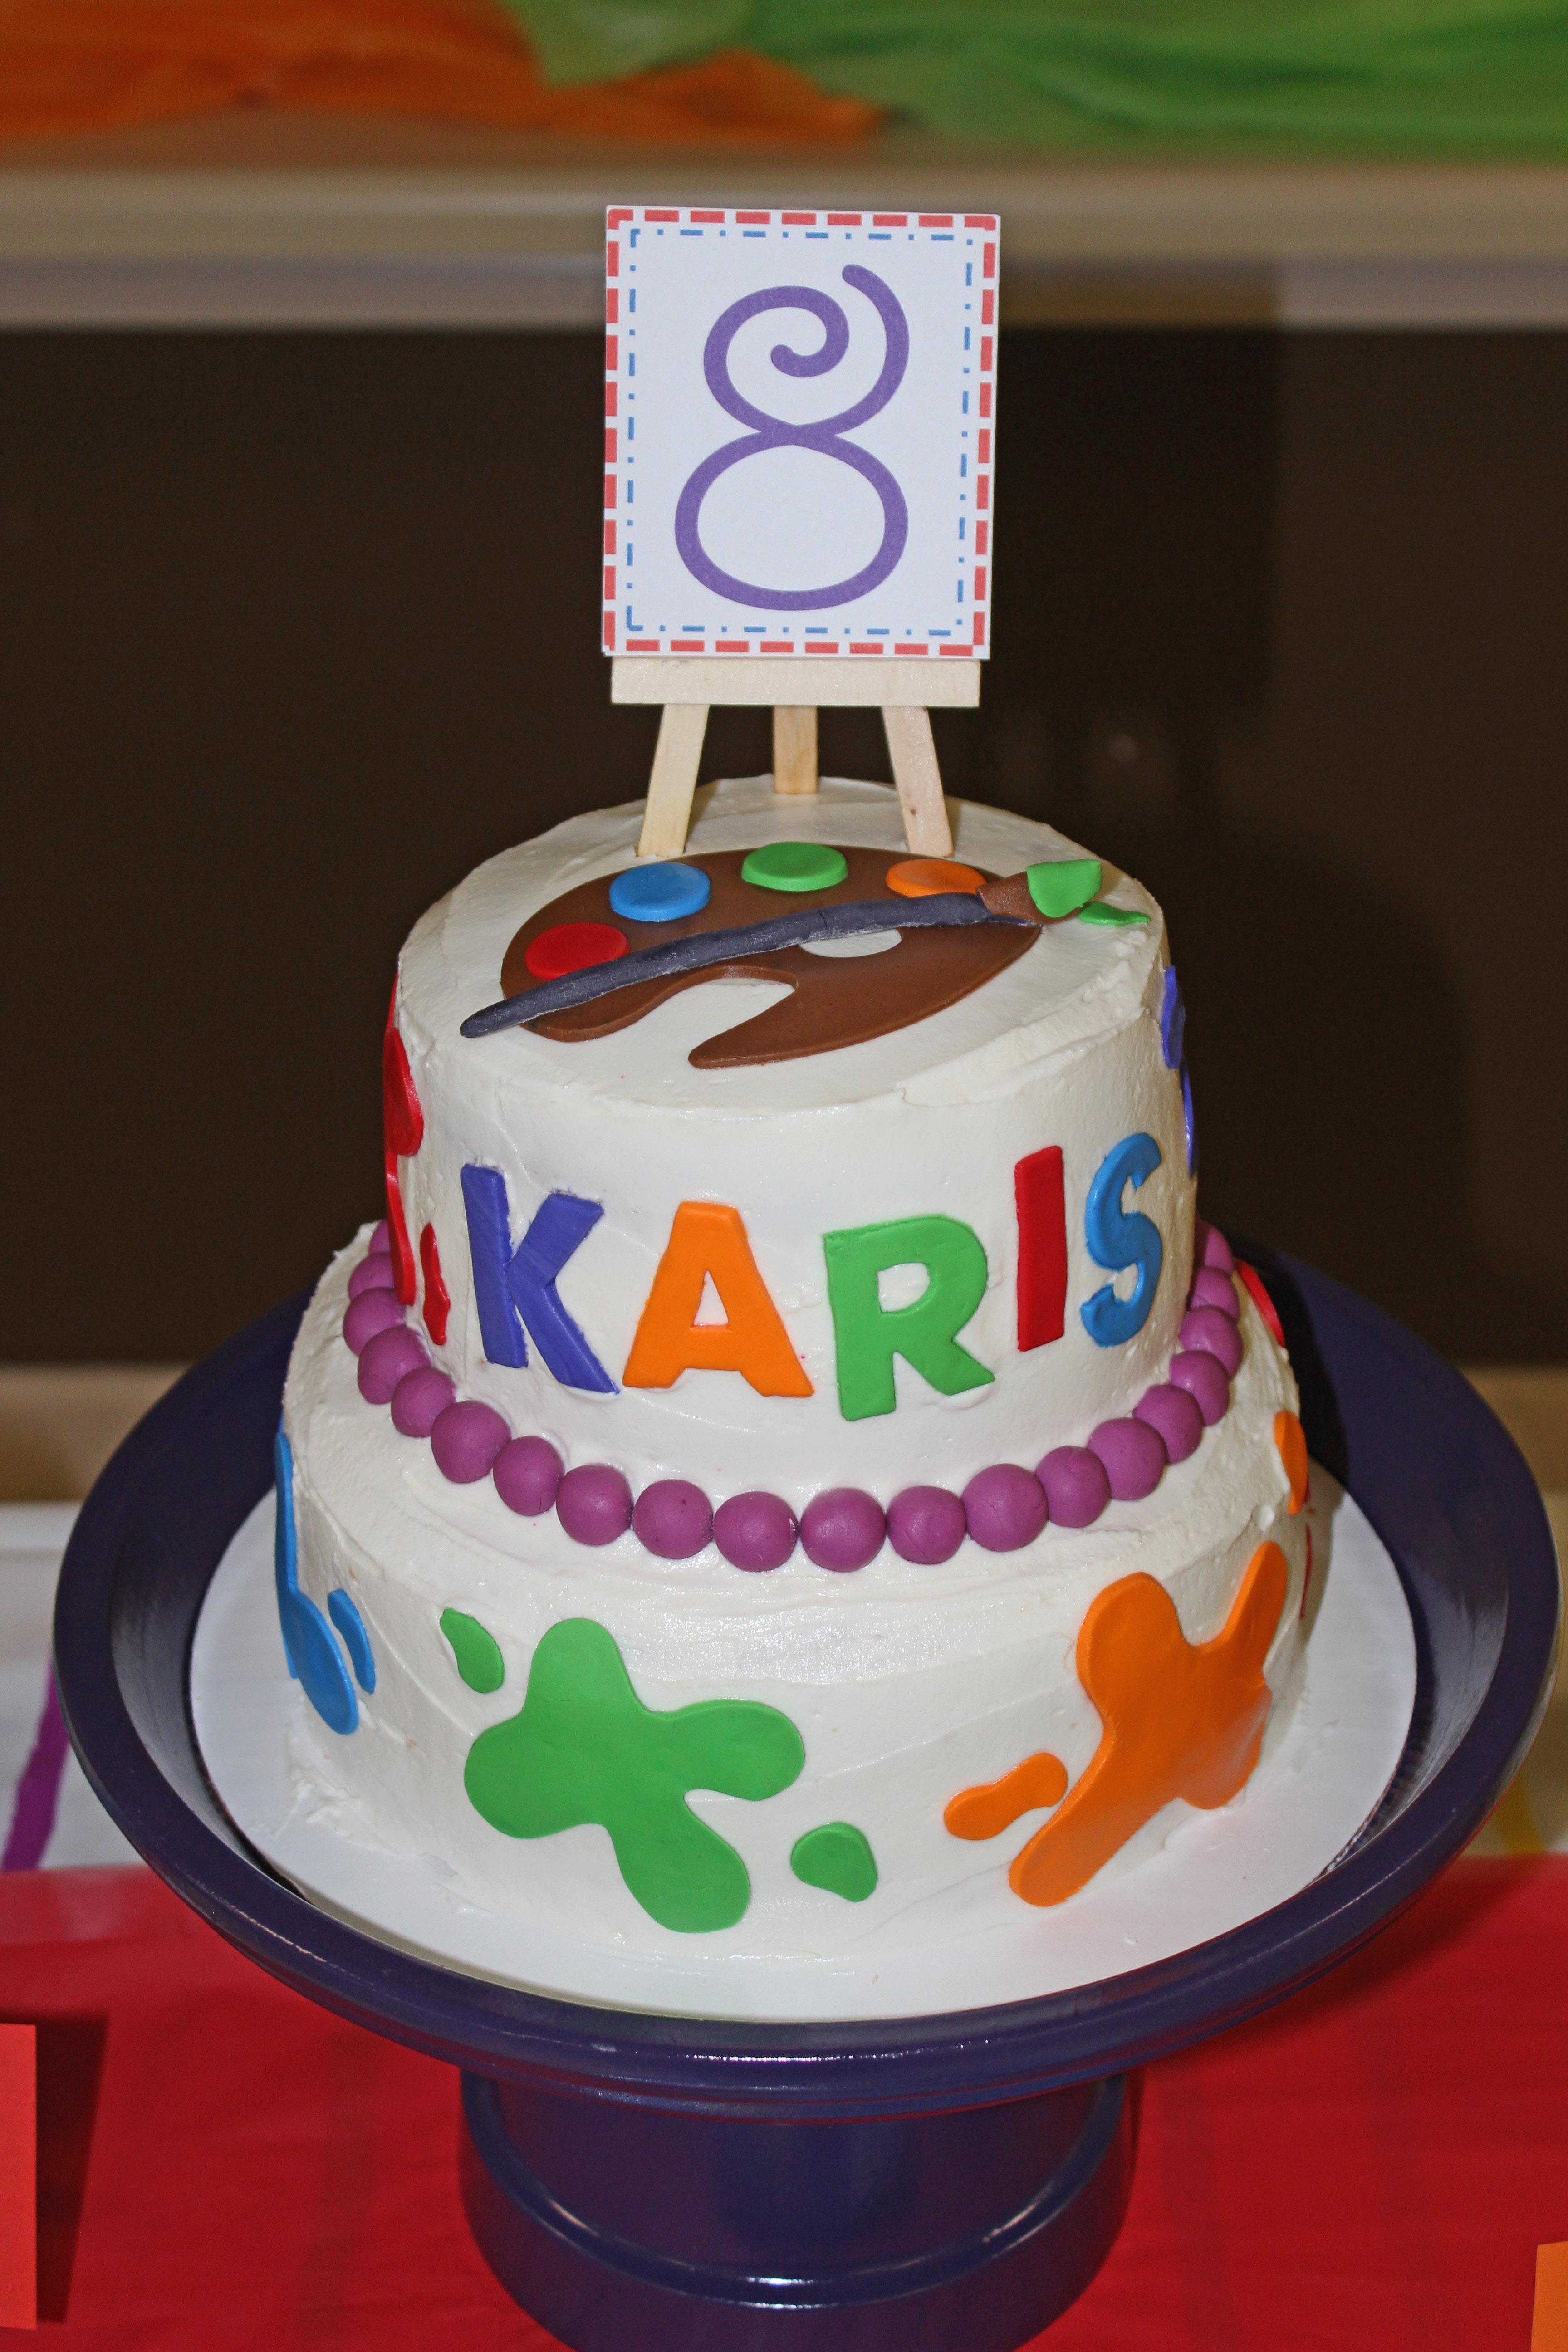 Large Art Themed Birthday Cakes Photo Cake Ideas Jpg 3456x5184 Party